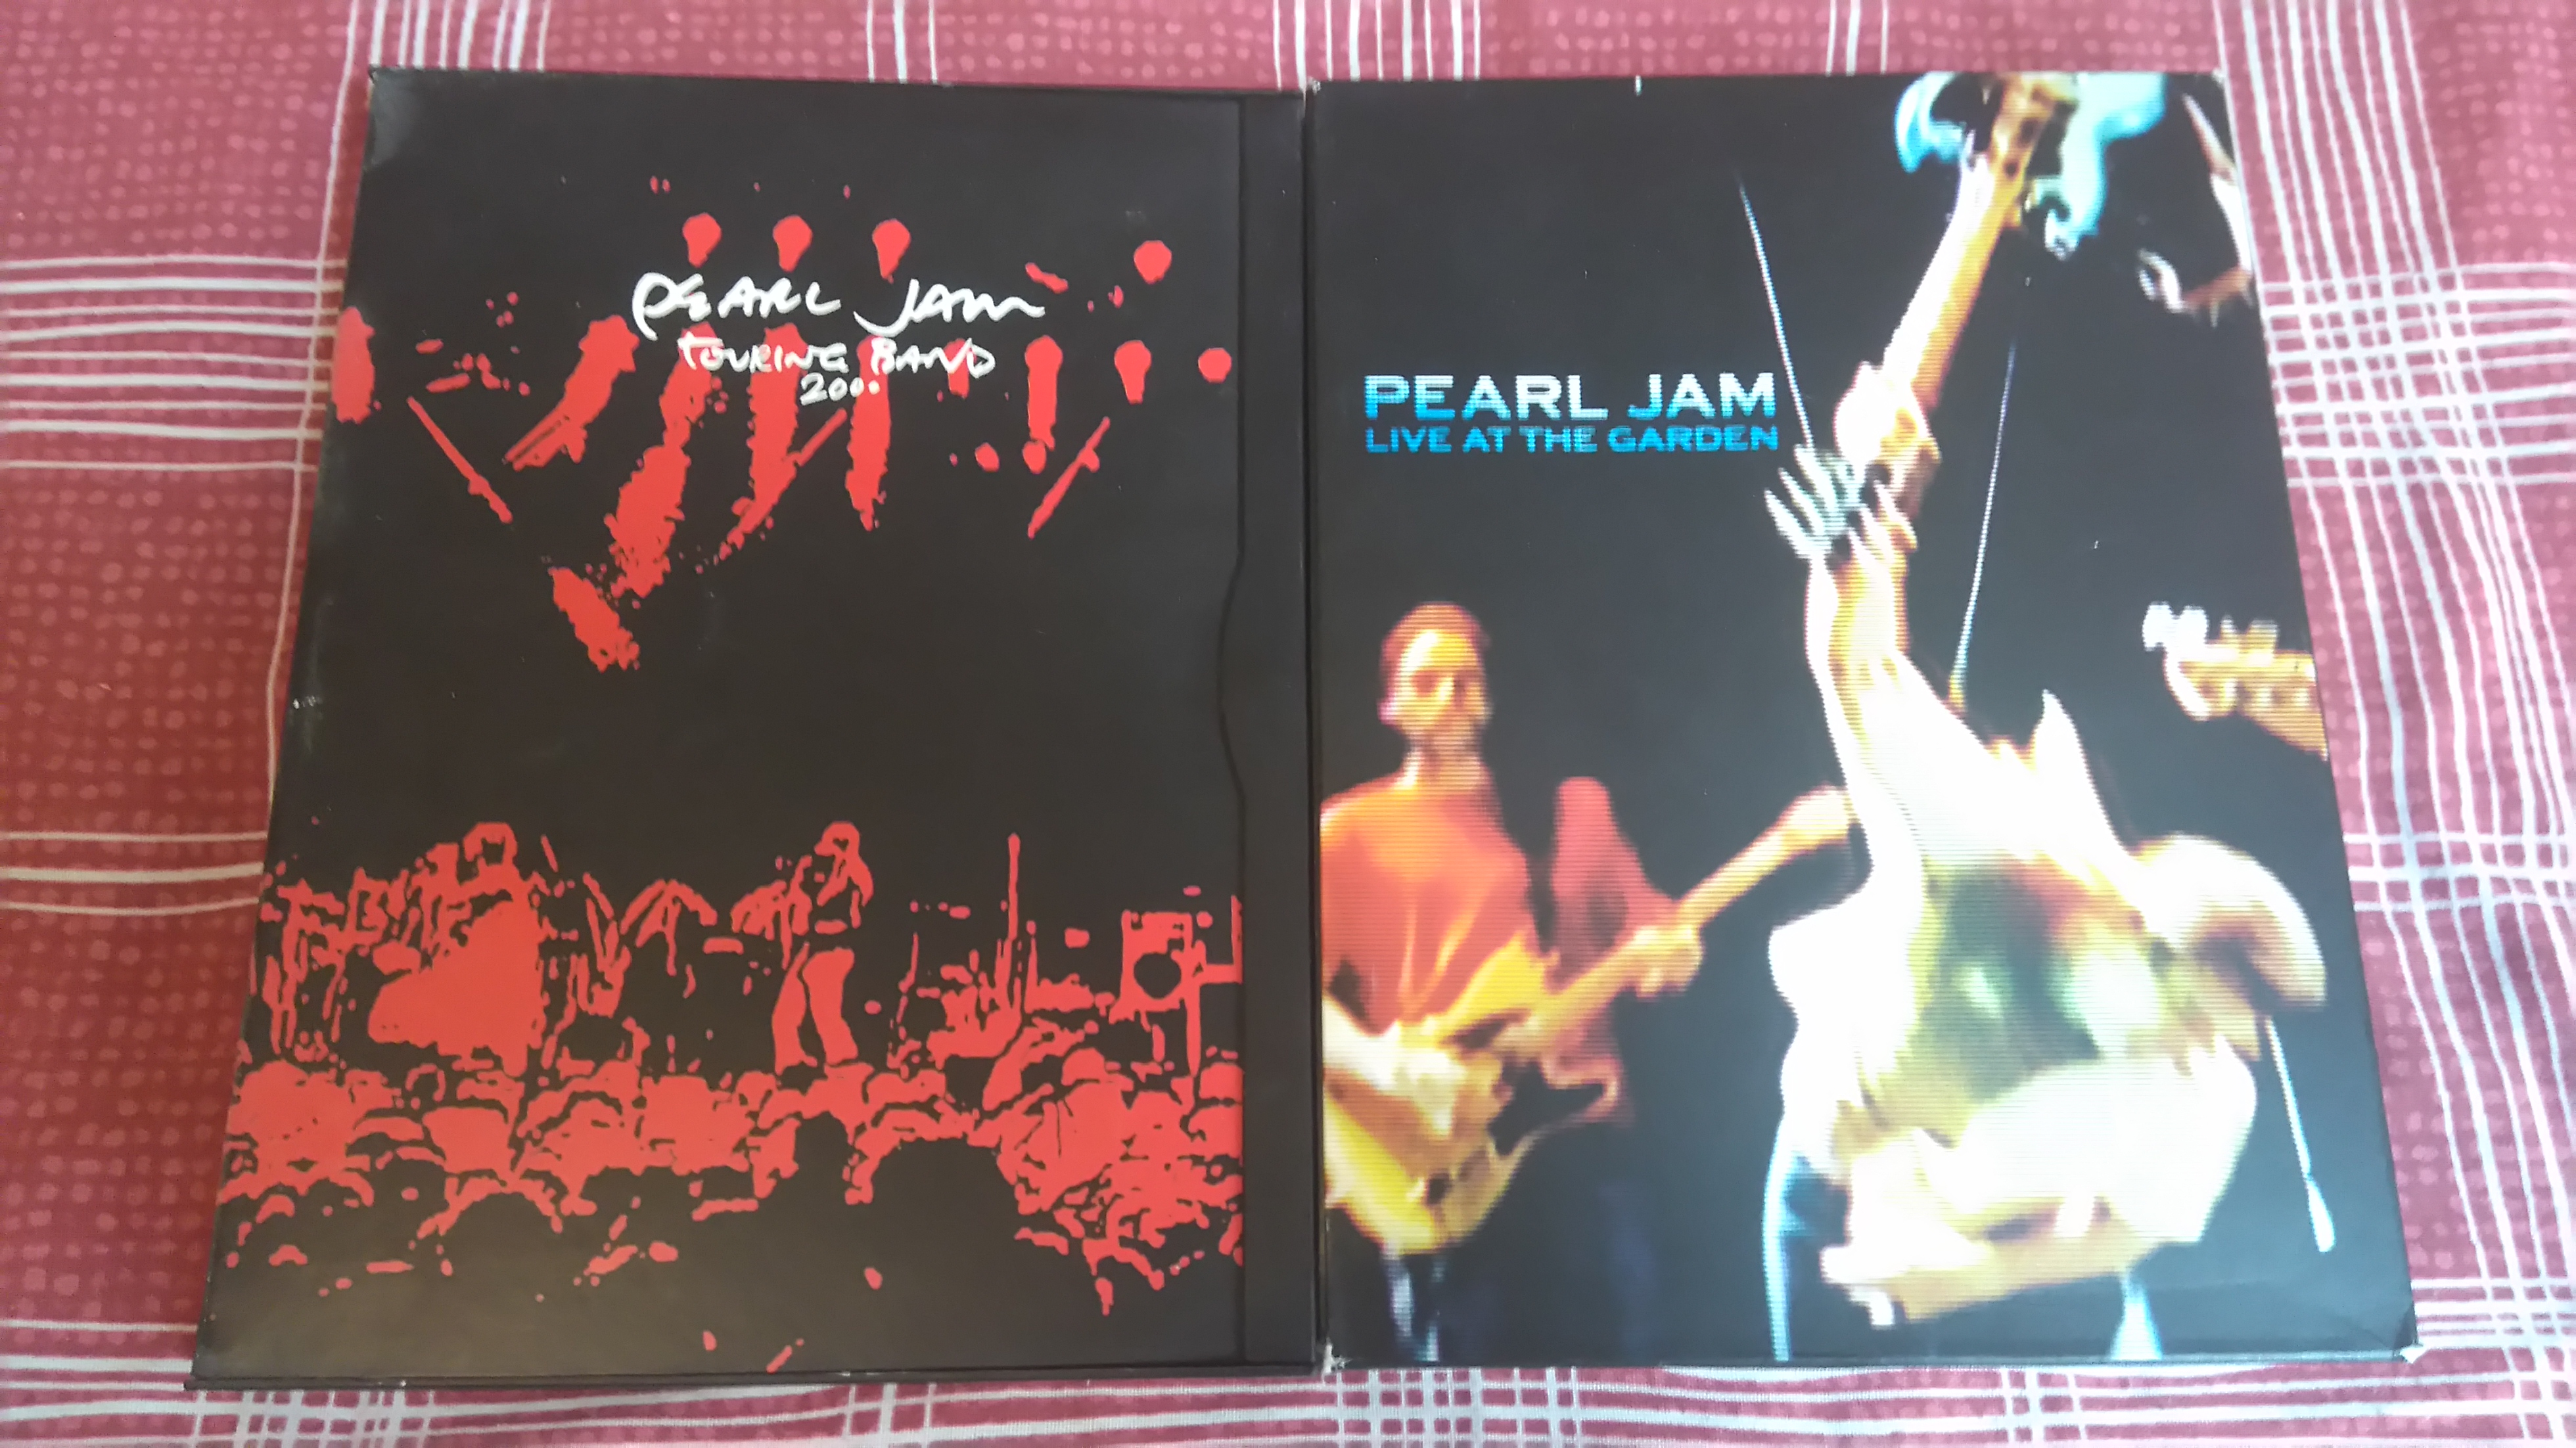 Pearl Jam dvd.JPG